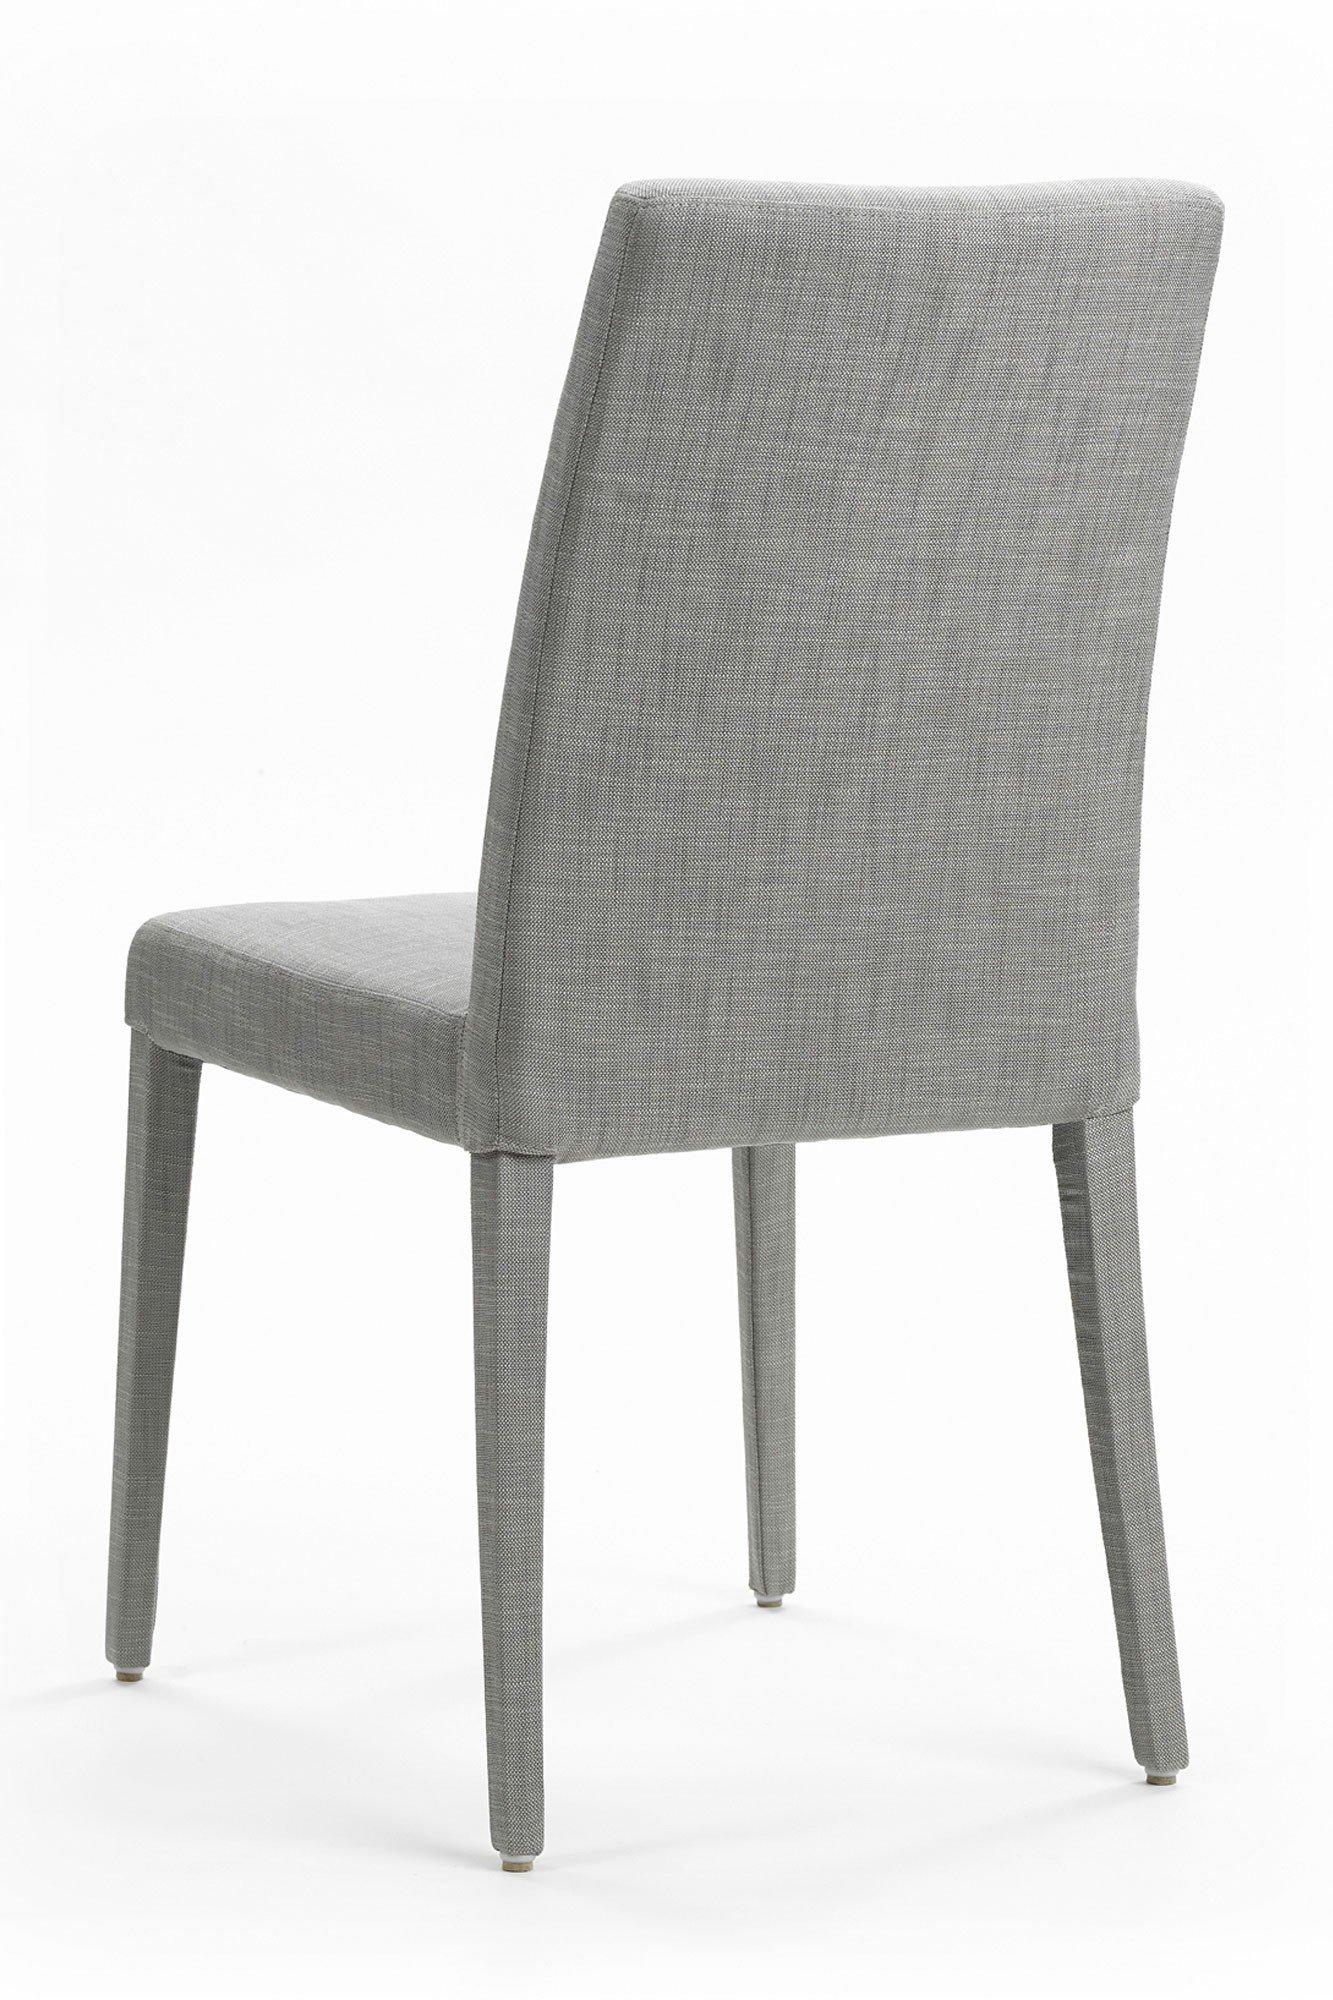 Mobitec stuhl slimm cover grey mit hoher lehne m bel for Stuhl mit hoher lehne